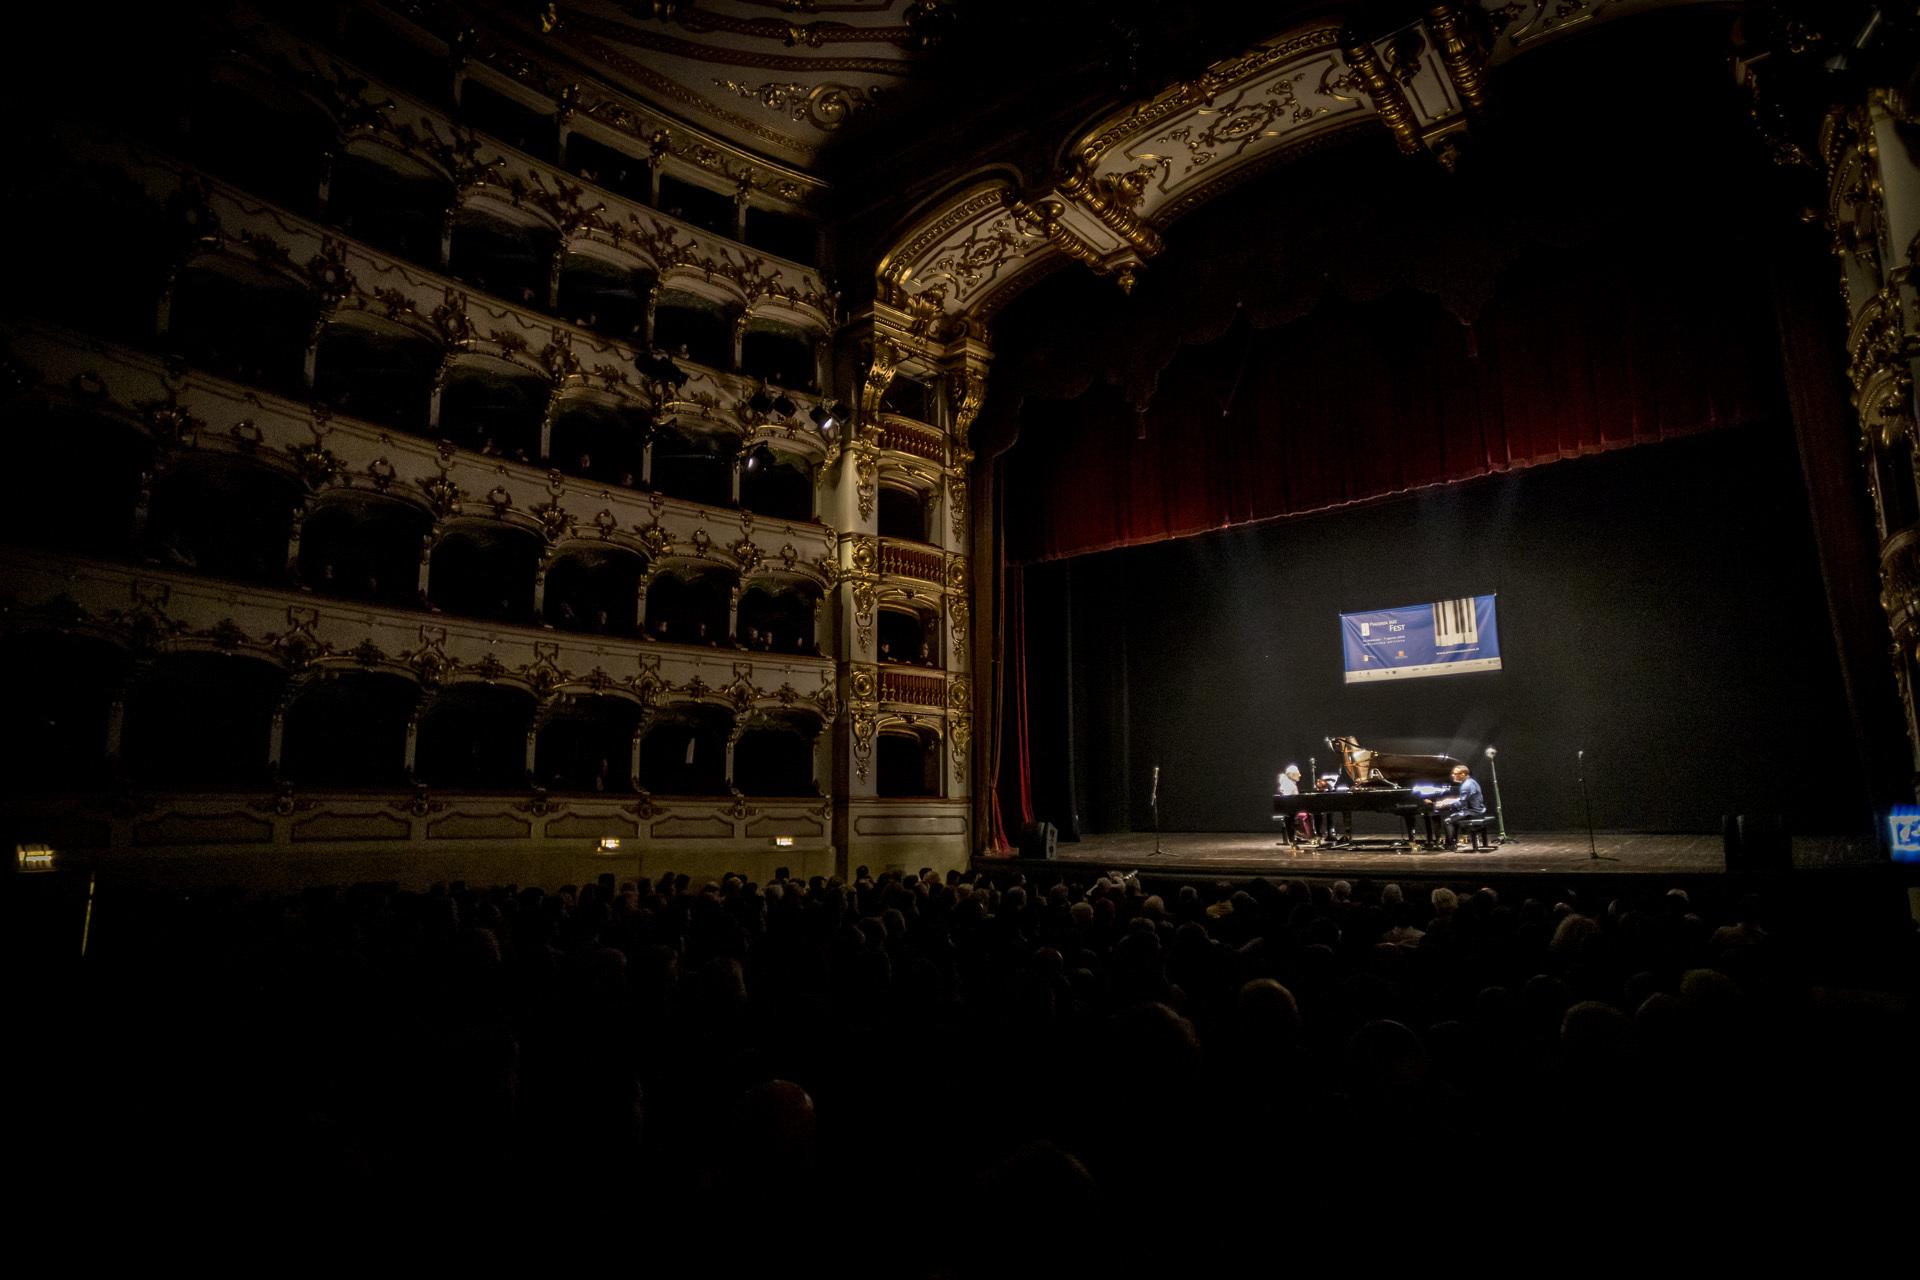 2019_03_27-Bollani-Rubalcaba-Piacenza-Jazz-©-Luca-Vantusso-213951-5D4B0314